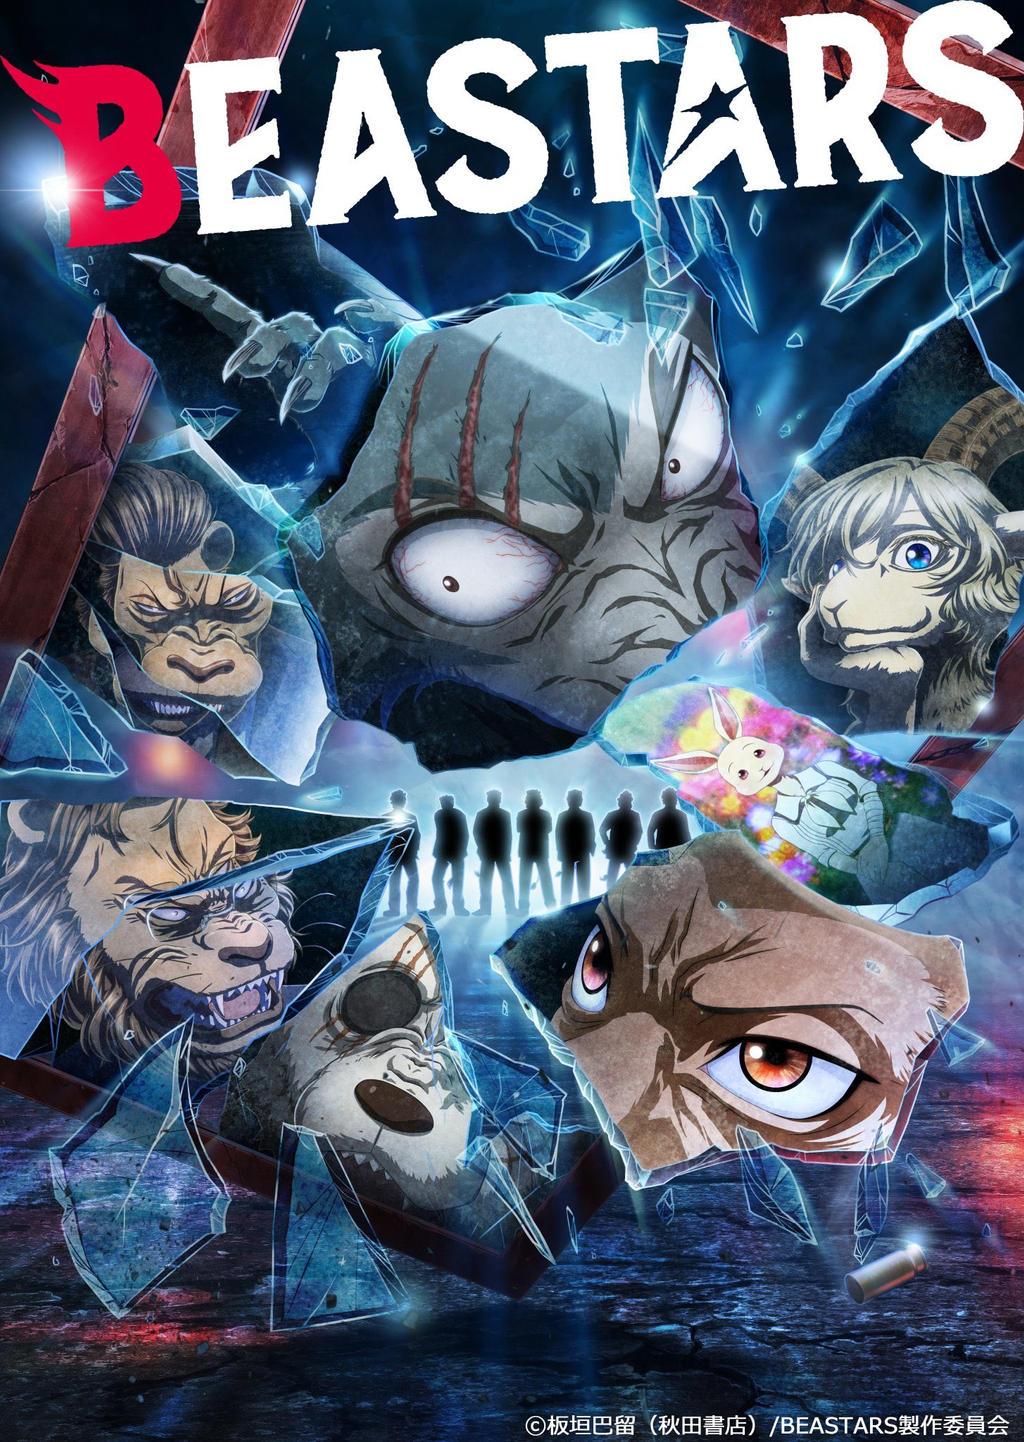 Beastars Anime Season 2 Poster by Madarao123 on DeviantArt